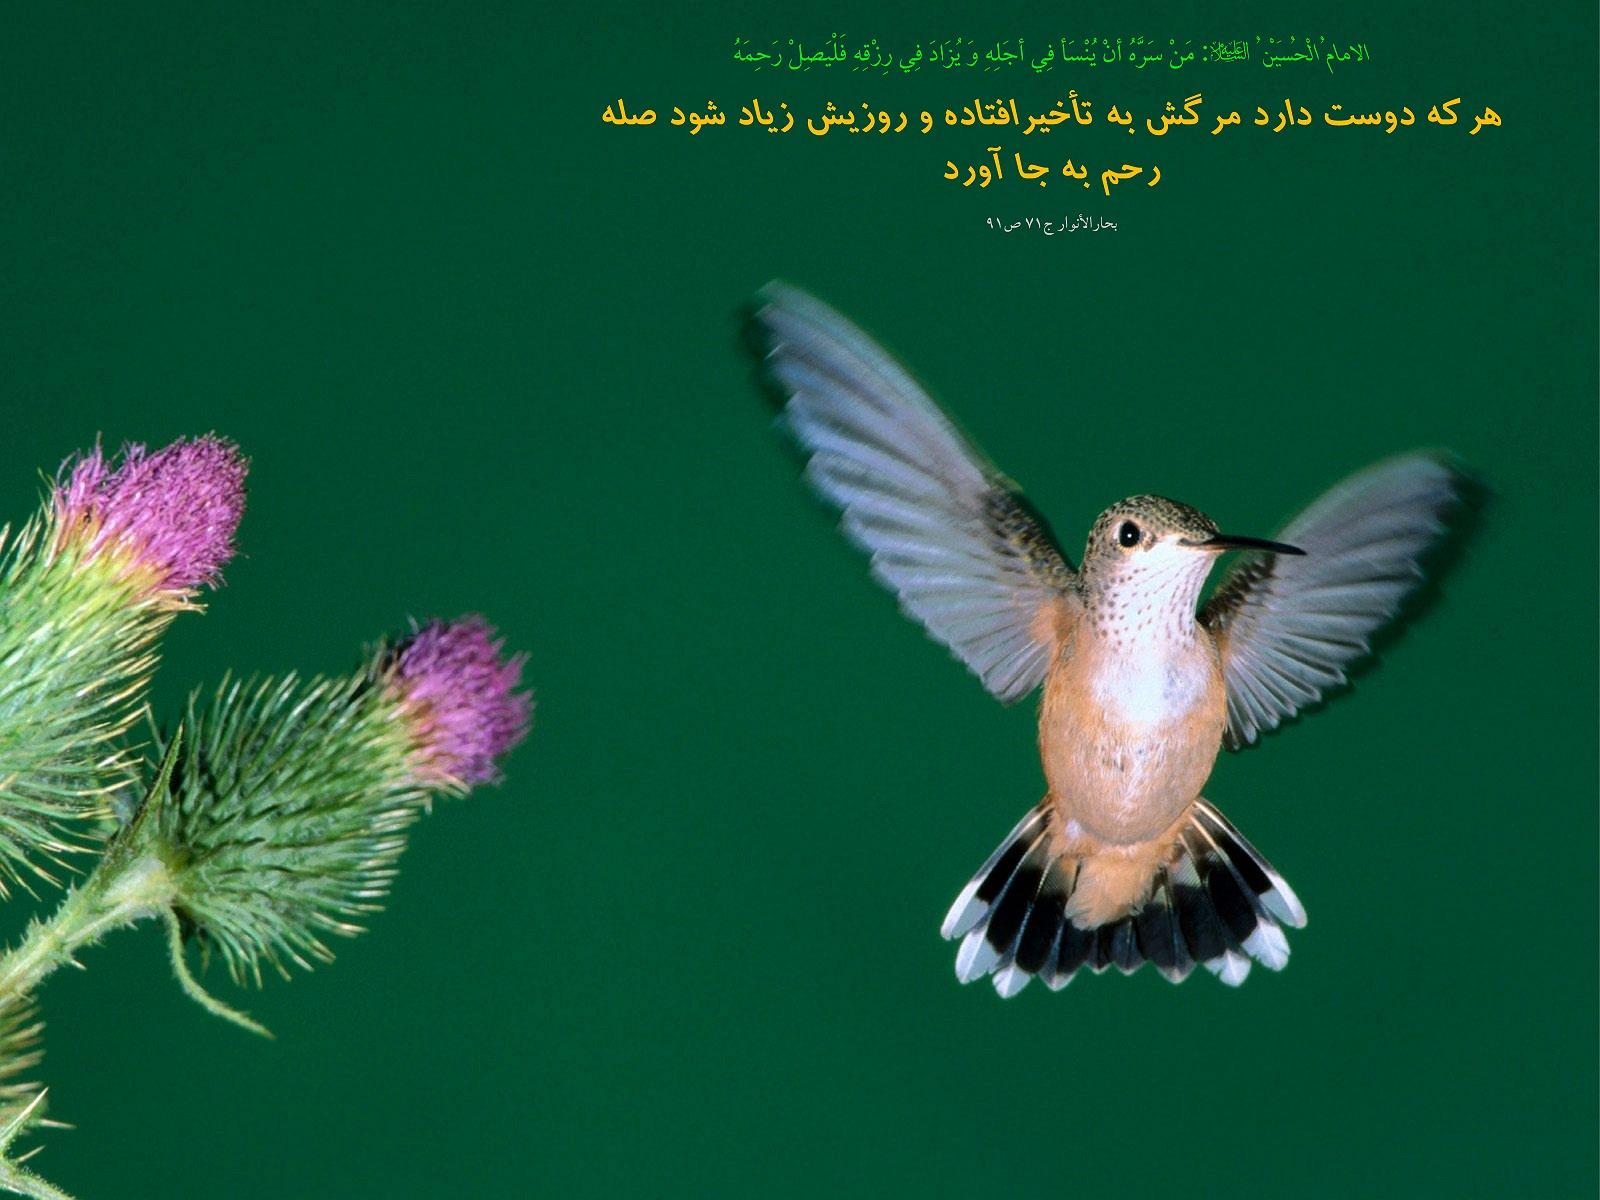 http://mhkh1972.gohardasht.com/uploaded/_170D1441-699A-4106-BF7F-580CB6FC6C04_.jpg